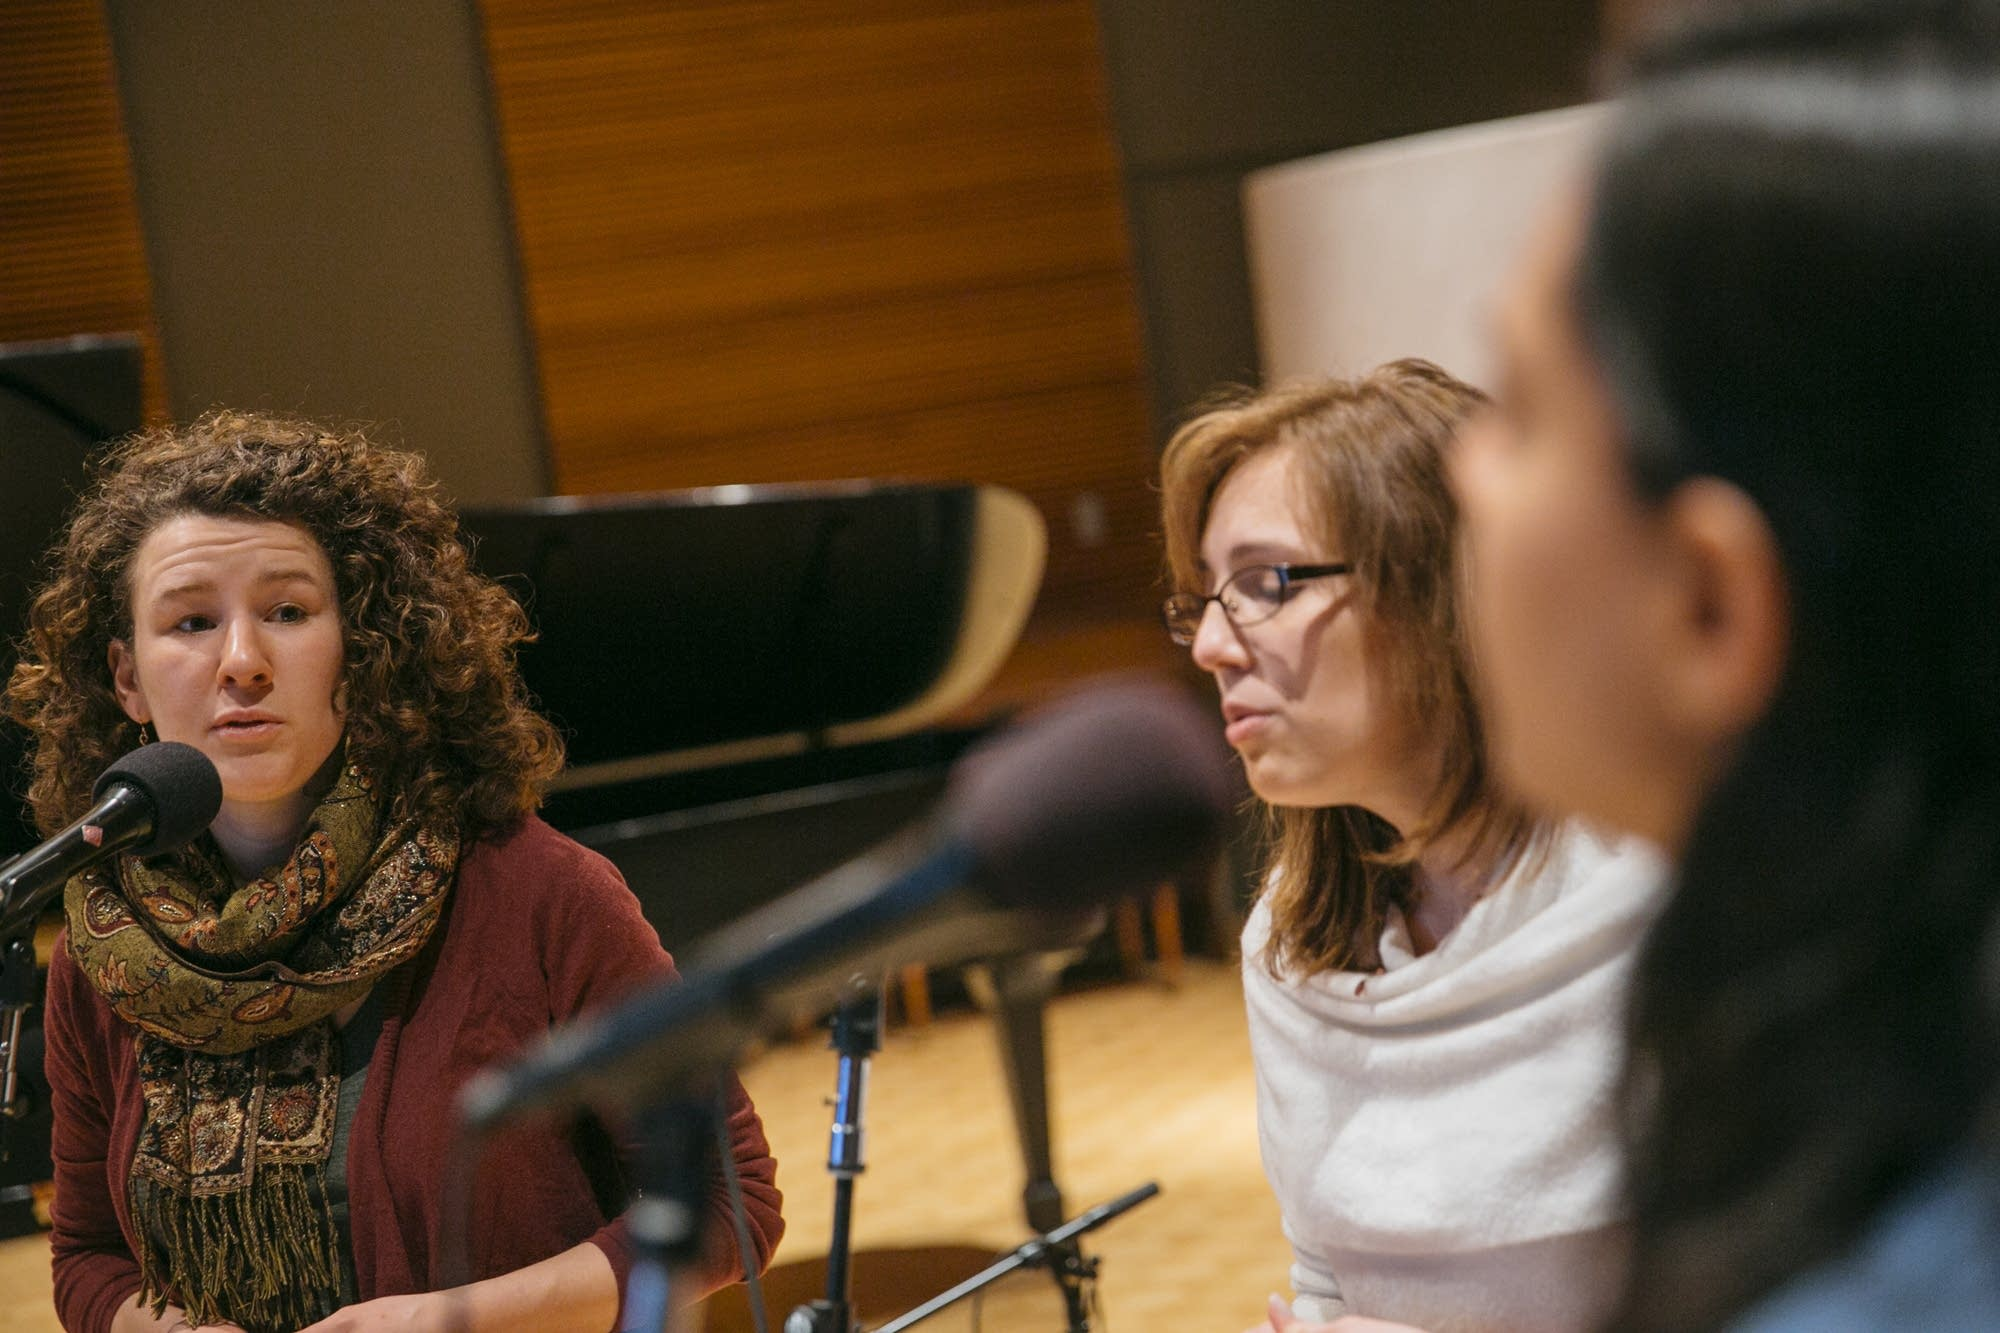 Sarah Larsson, left, sings in the Nightingale Trio